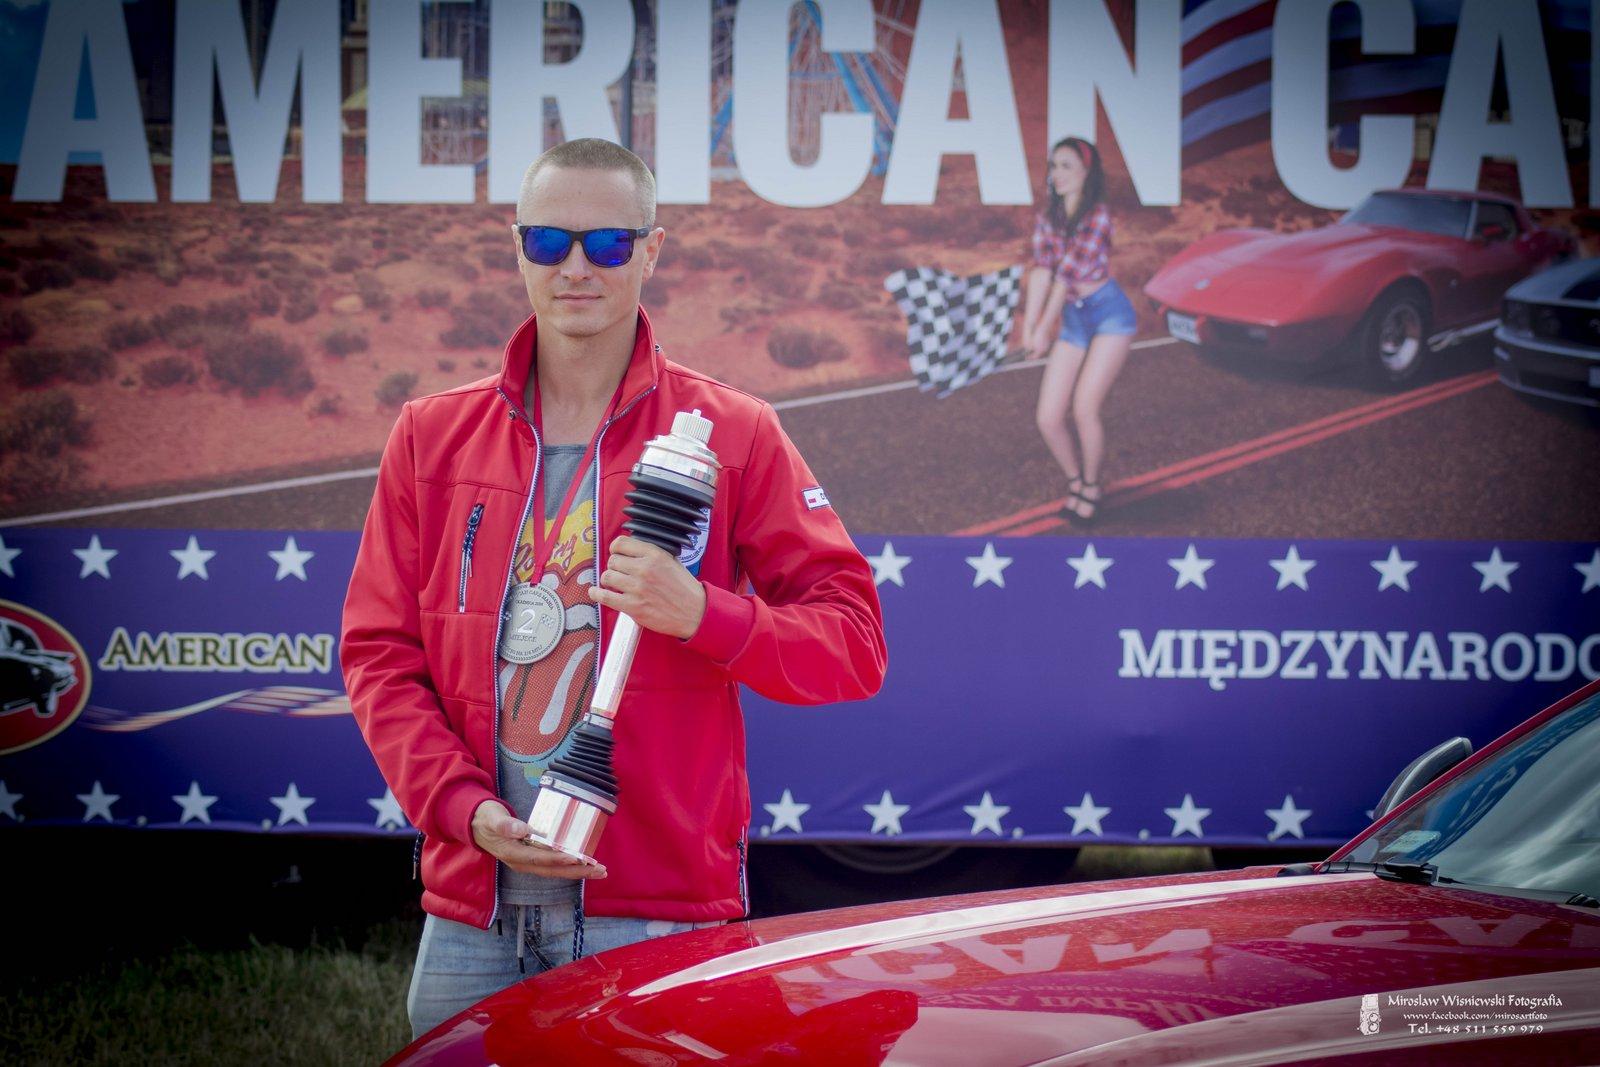 Miroslaw Wisniewski, American Cars Mania 2019